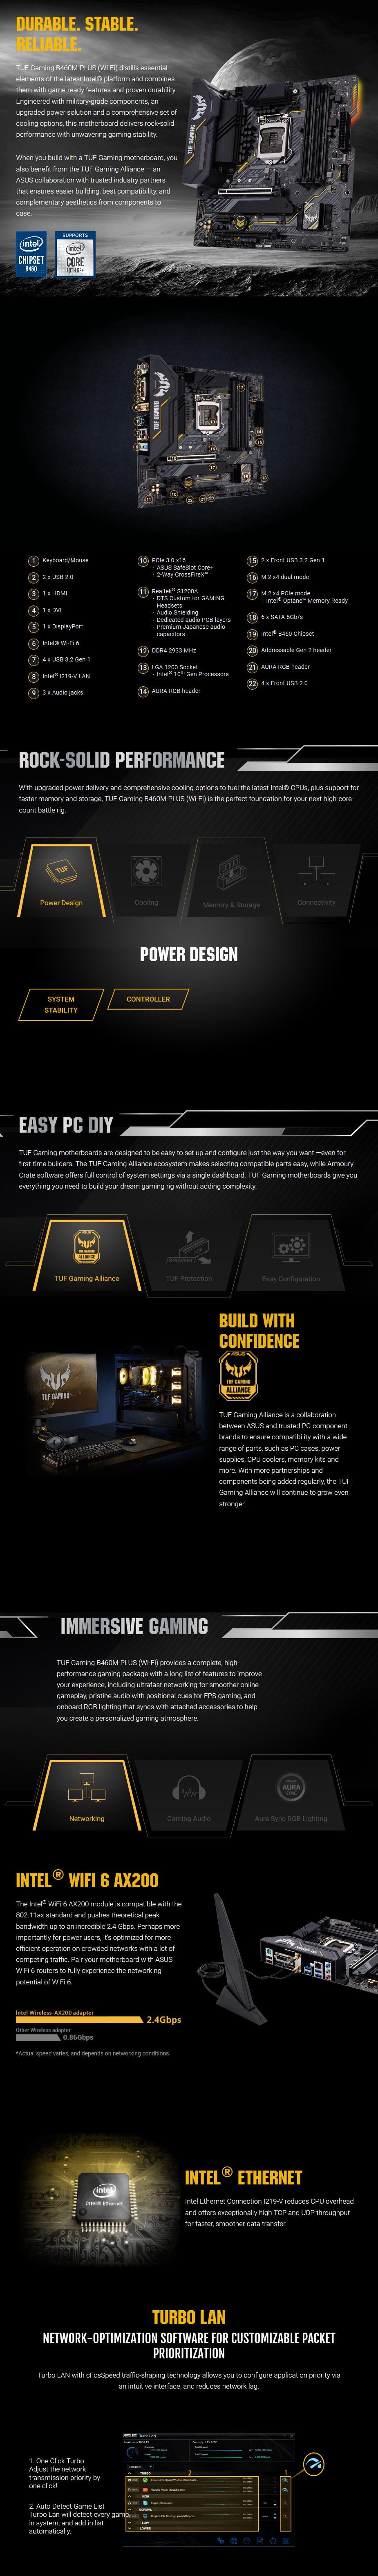 asus-tuf-gaming-b460mplus-wifi-lga-1200-microatx-motherboard-ac35254-10.jpg